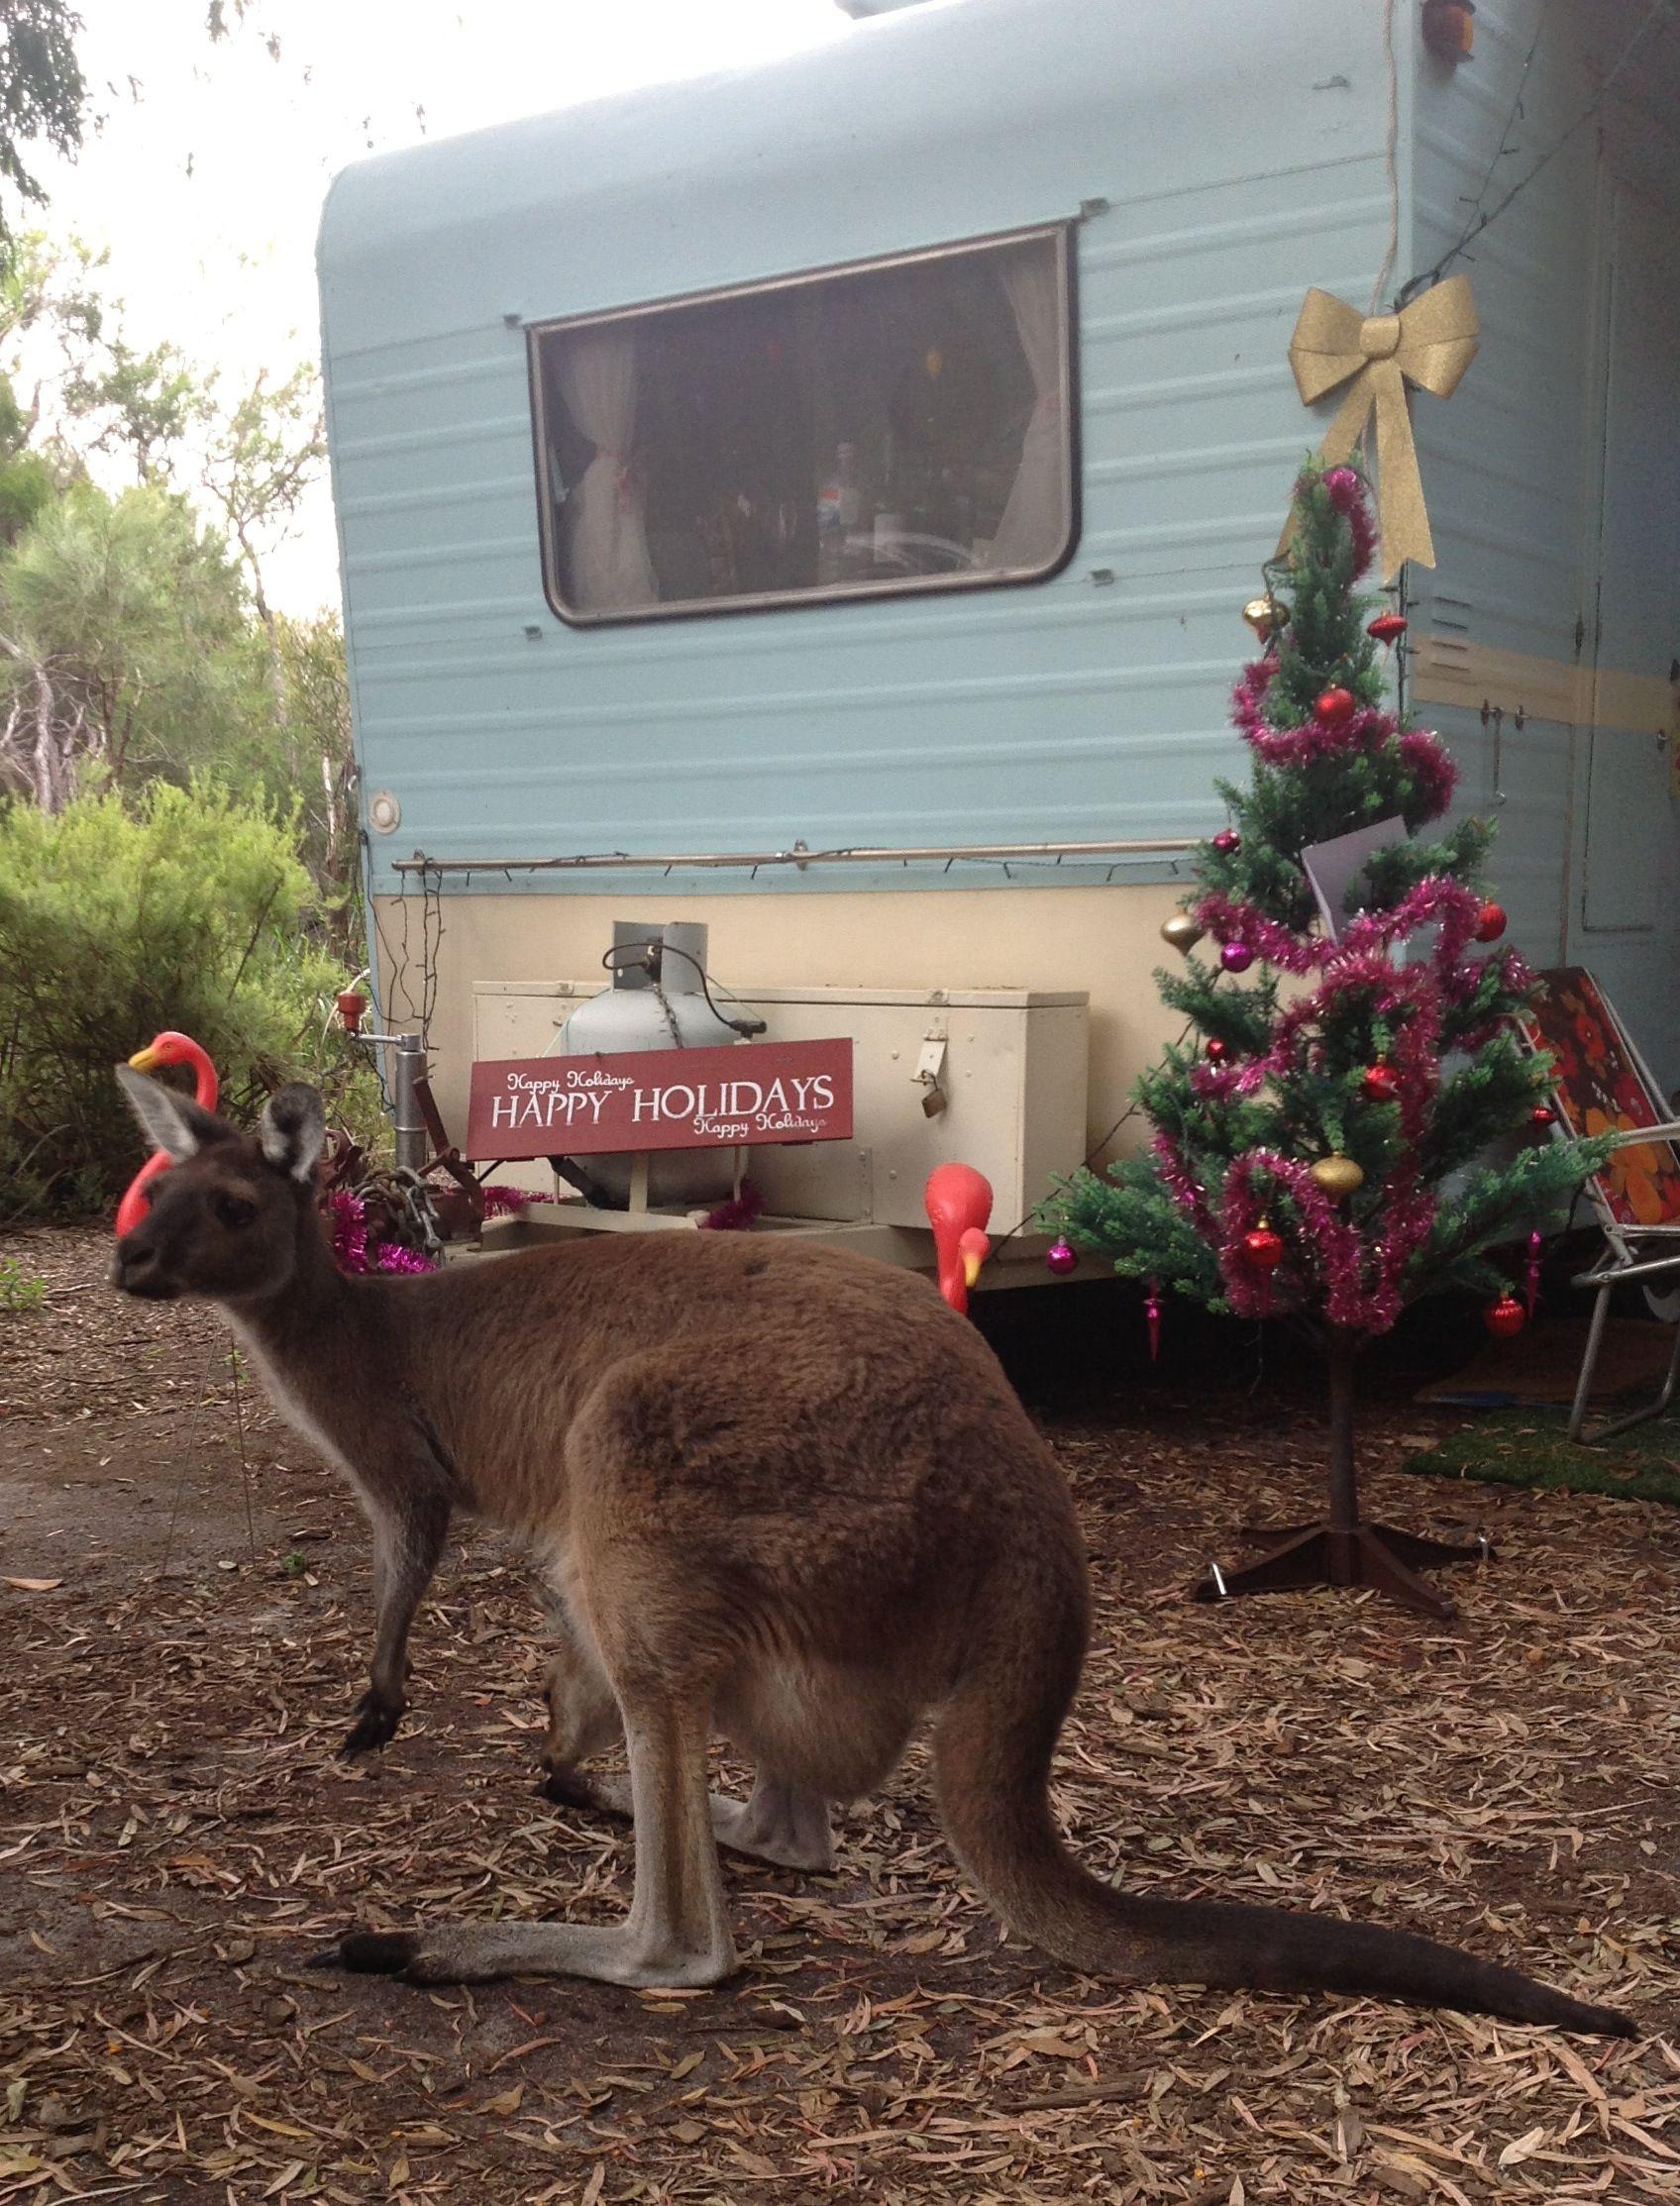 Christmas Camping Australia.Merry Vintage Caravan Kangaroo Christmas From Australia